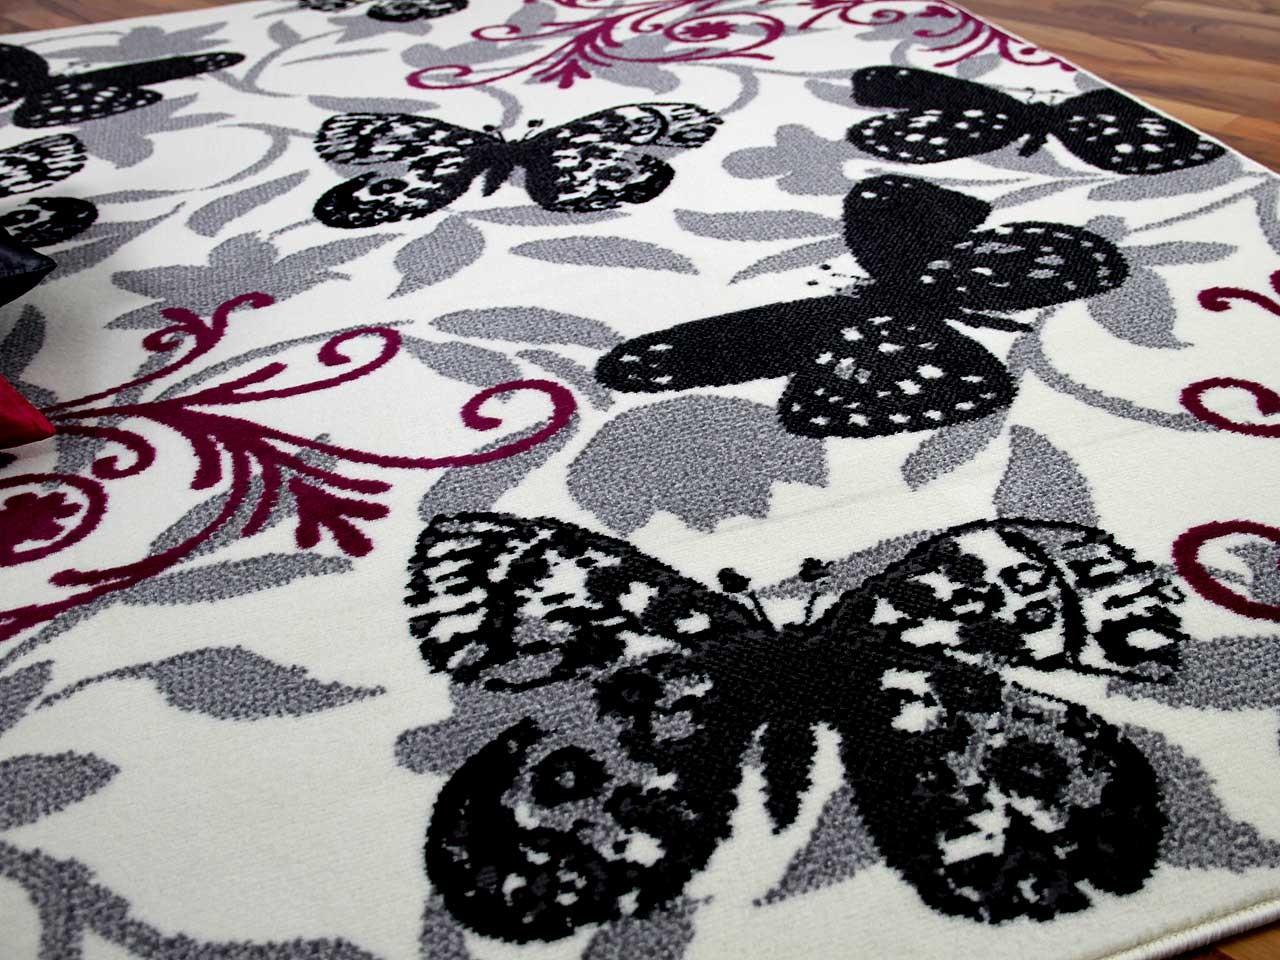 teppich trendline butterfly schwarz pink in 4 gr en teppiche designerteppiche trendline teppiche. Black Bedroom Furniture Sets. Home Design Ideas